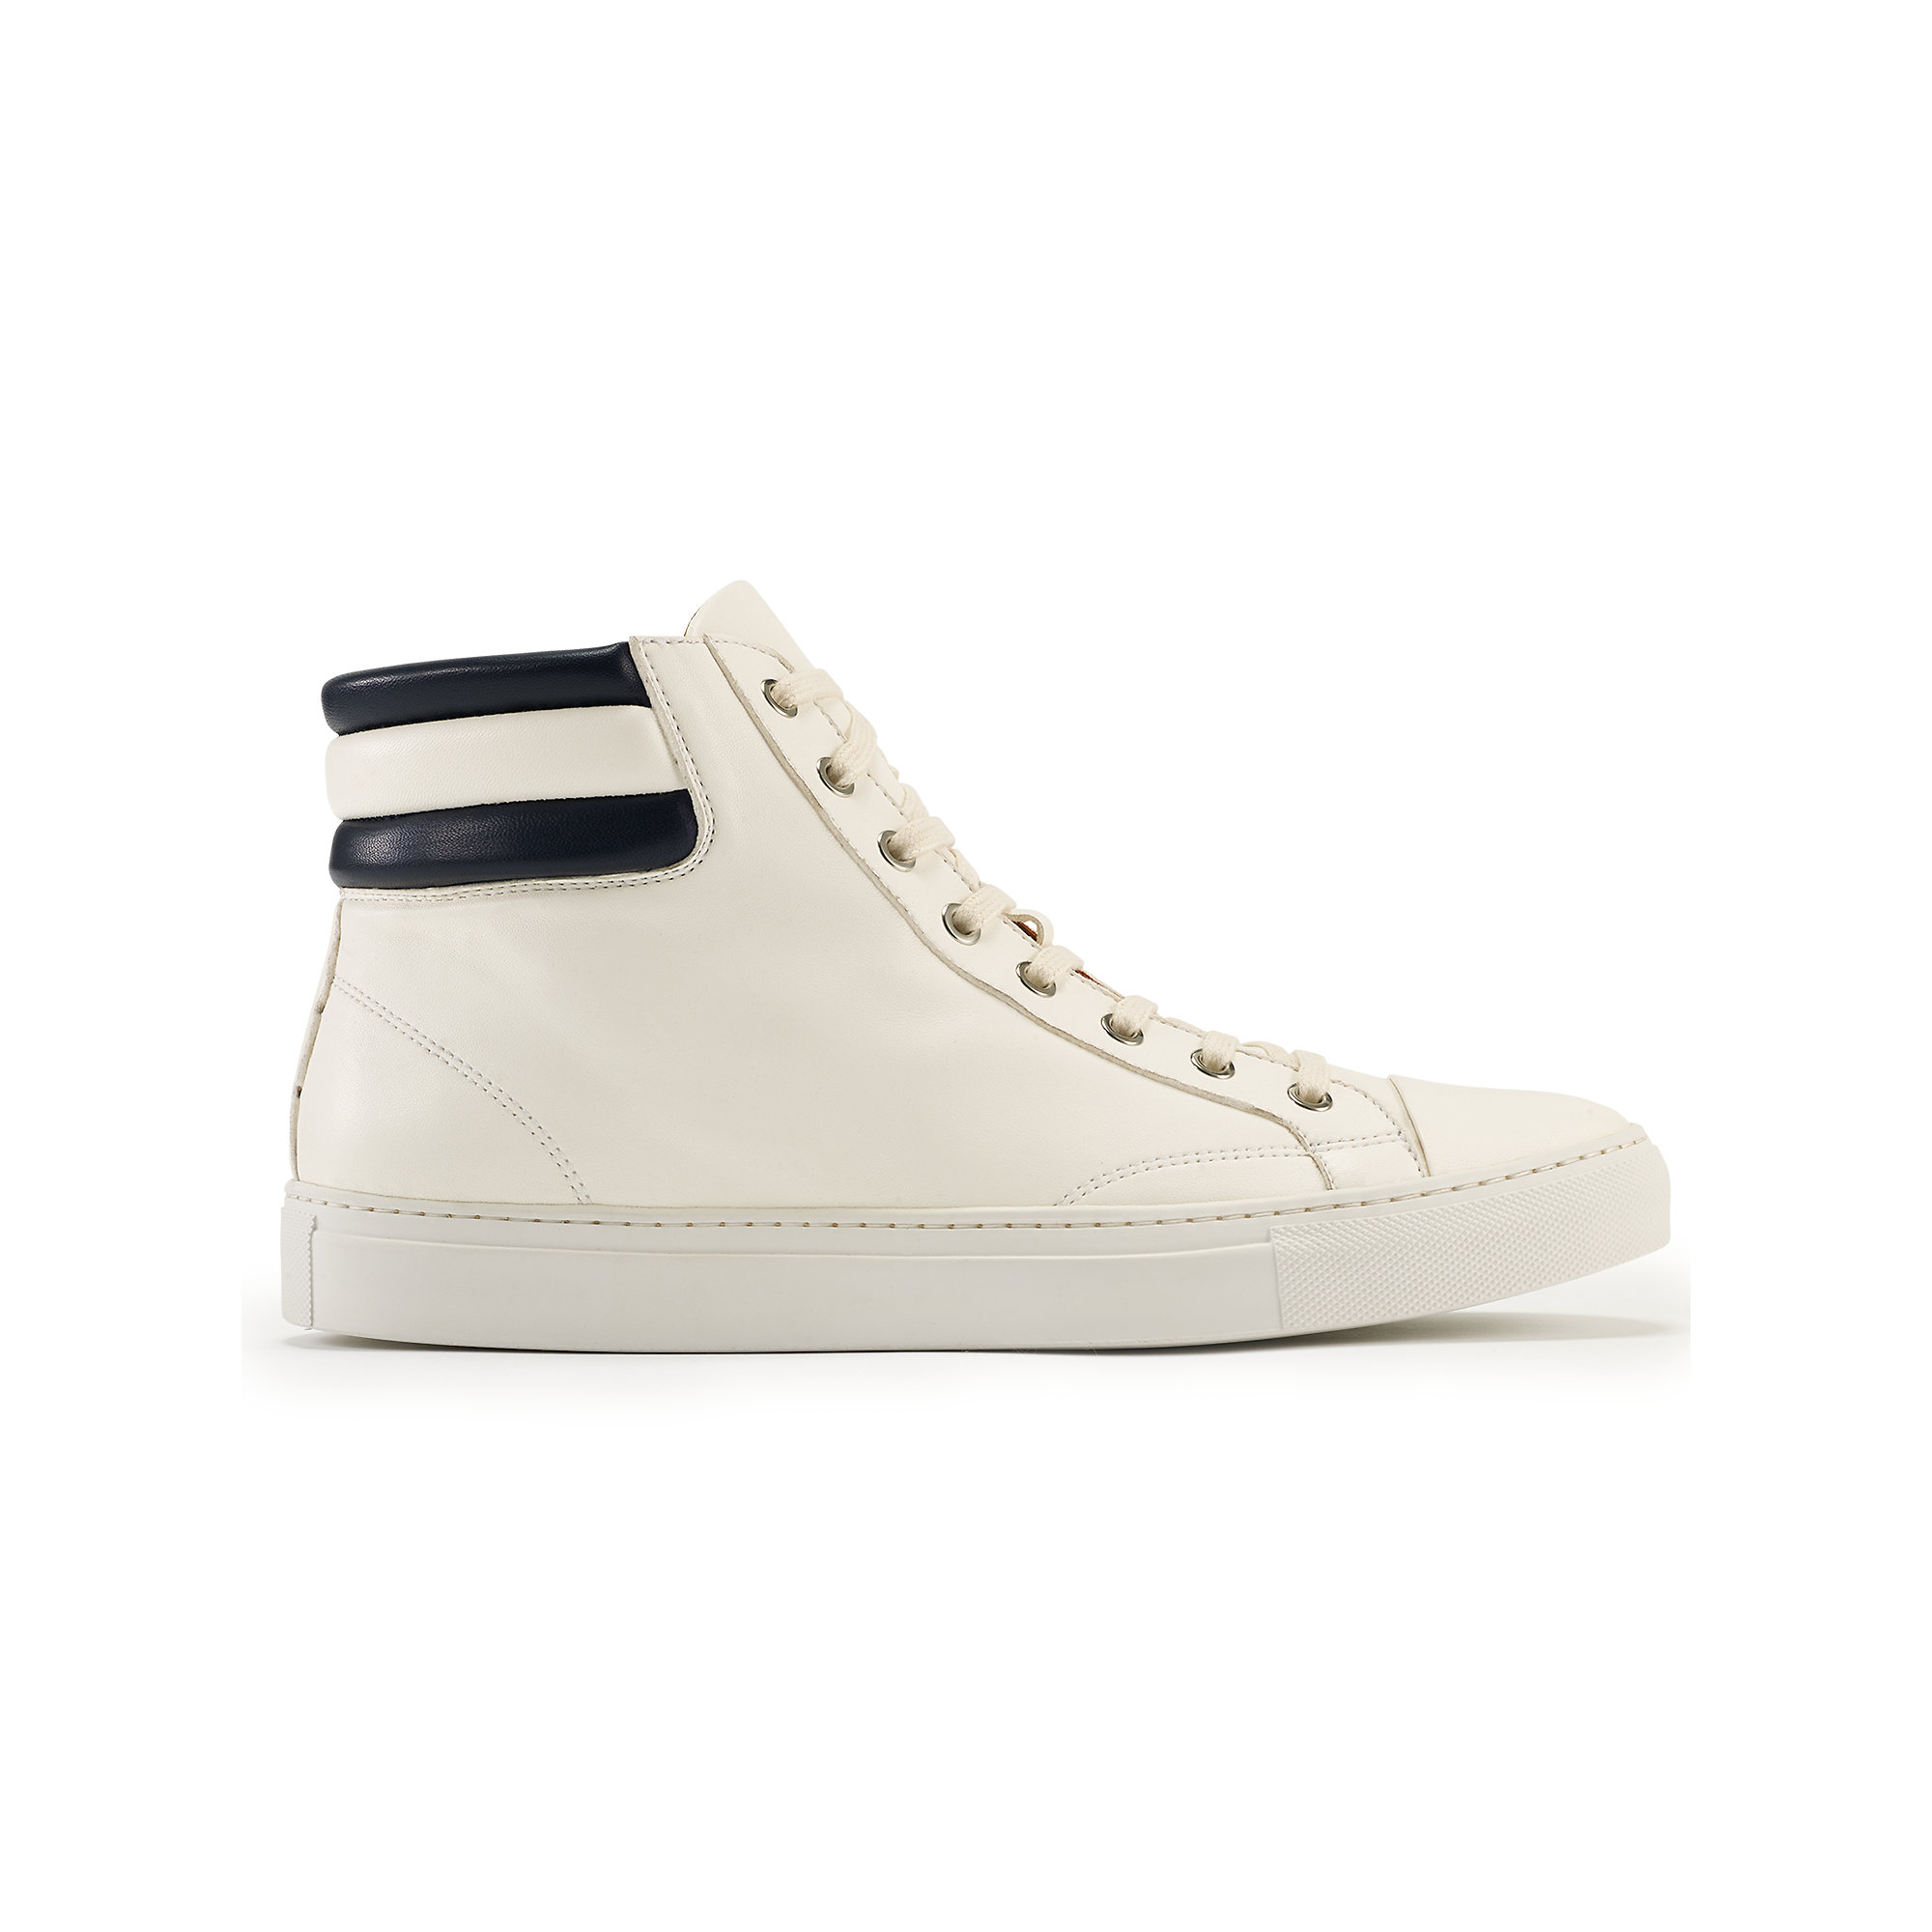 Https Shoes Lacoste Bowerey Off White 2015 11 26t14 Sandal Connec Arizona Navy Fuchsia Woman 36 Ralph Lauren Whitenavy Nappa Stamford Sneaker Product 1 974919811 Normaljpeg